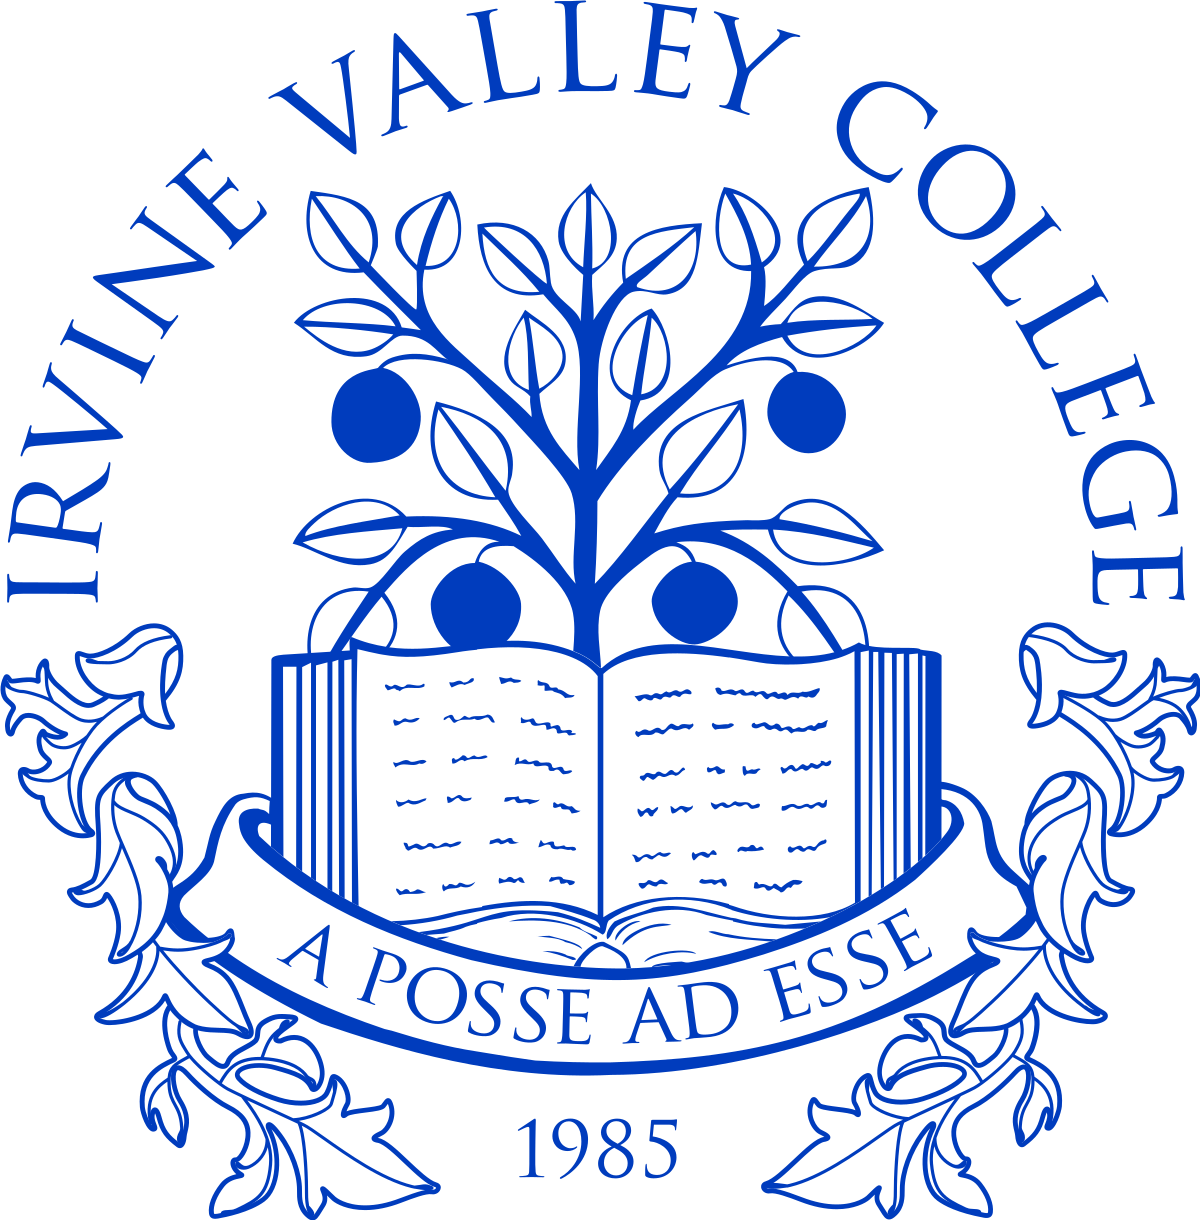 Irvine Valley College - 30 Best Community Colleges in California 2020